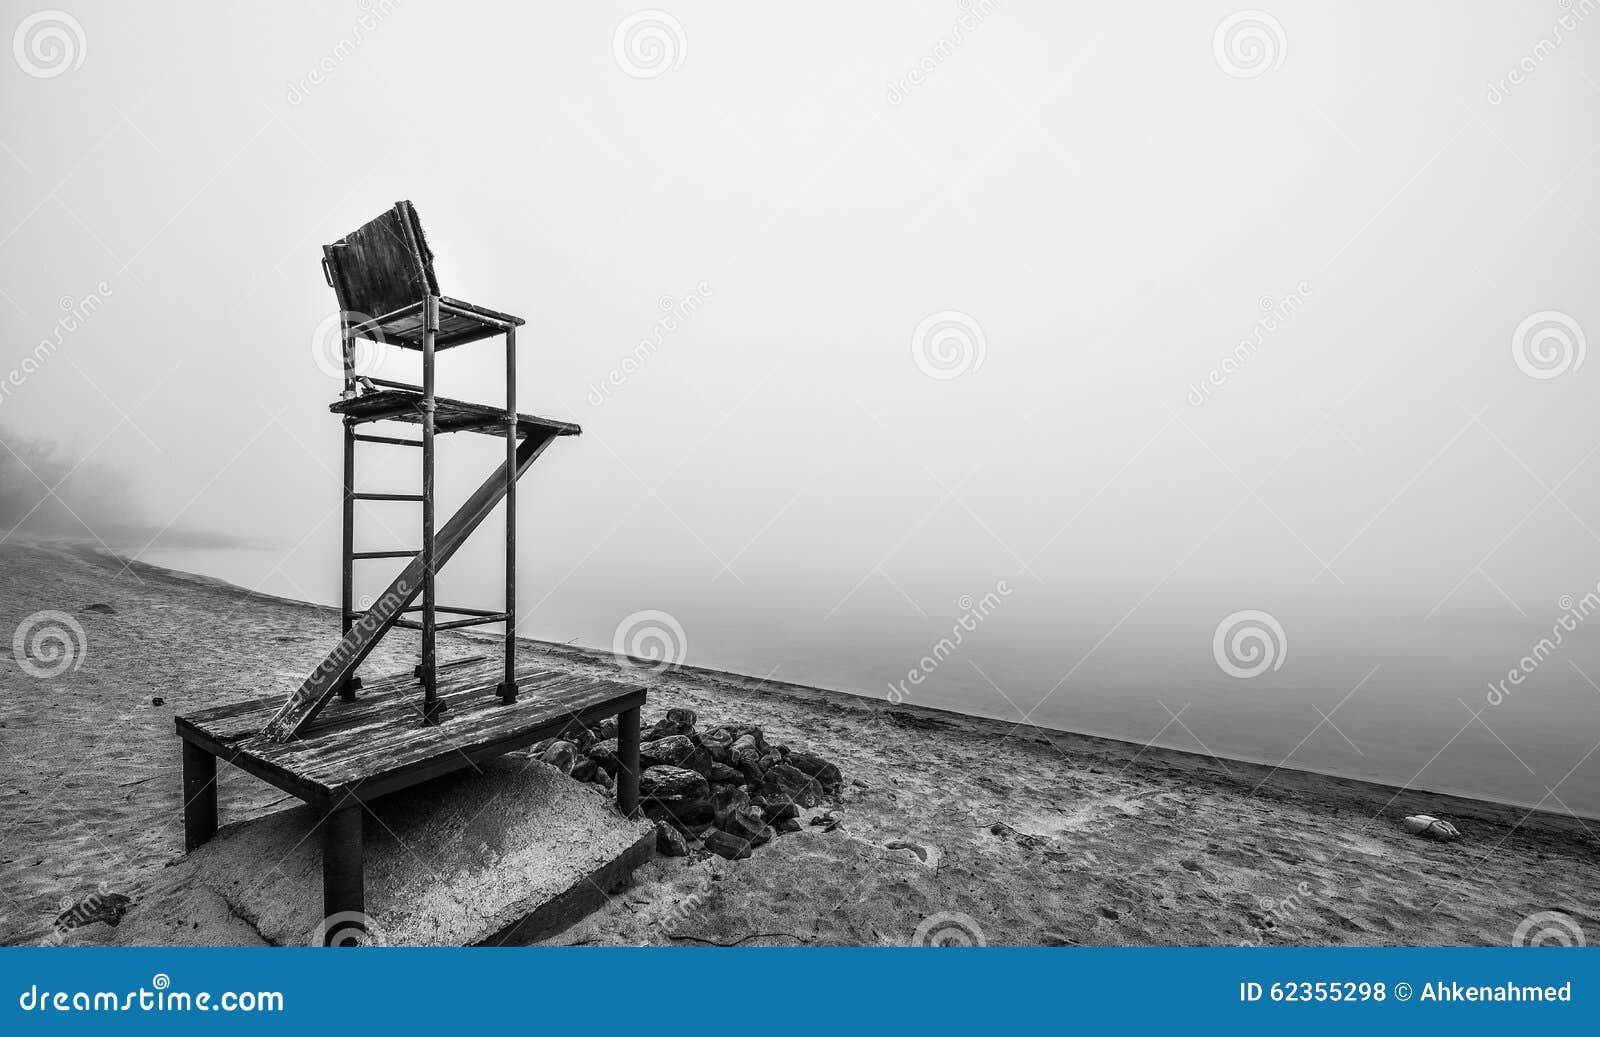 Empty lifeguard chair on the beach on a foggy morning.